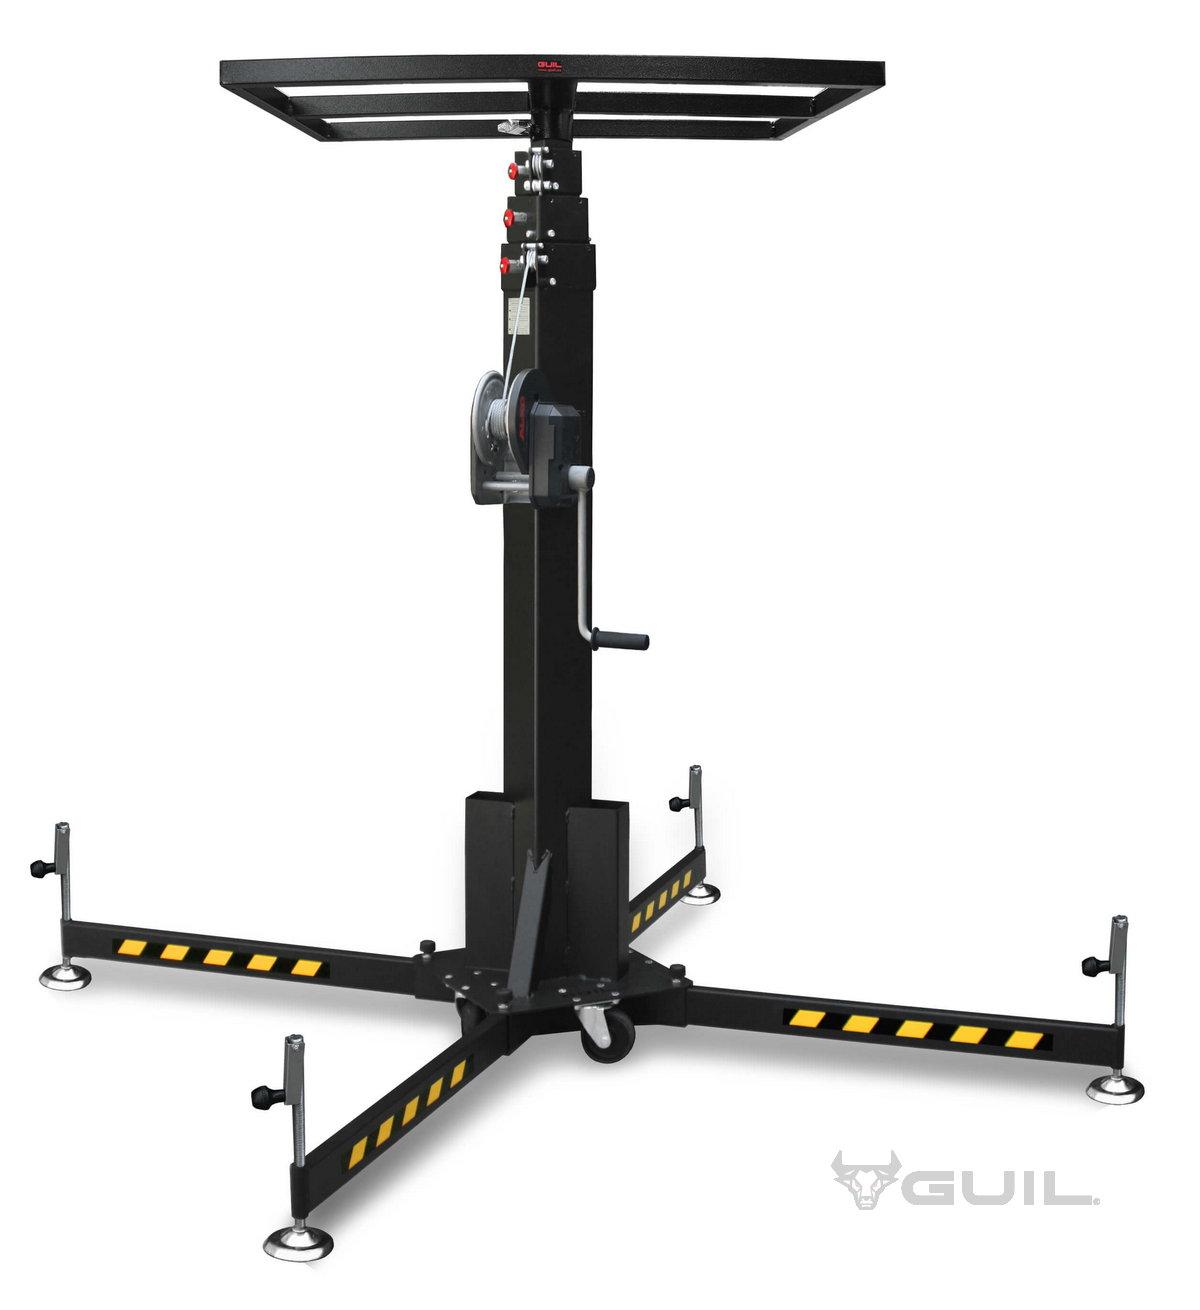 Materiaallift 1,8-5,2 m 280 kg (dutch) (3)